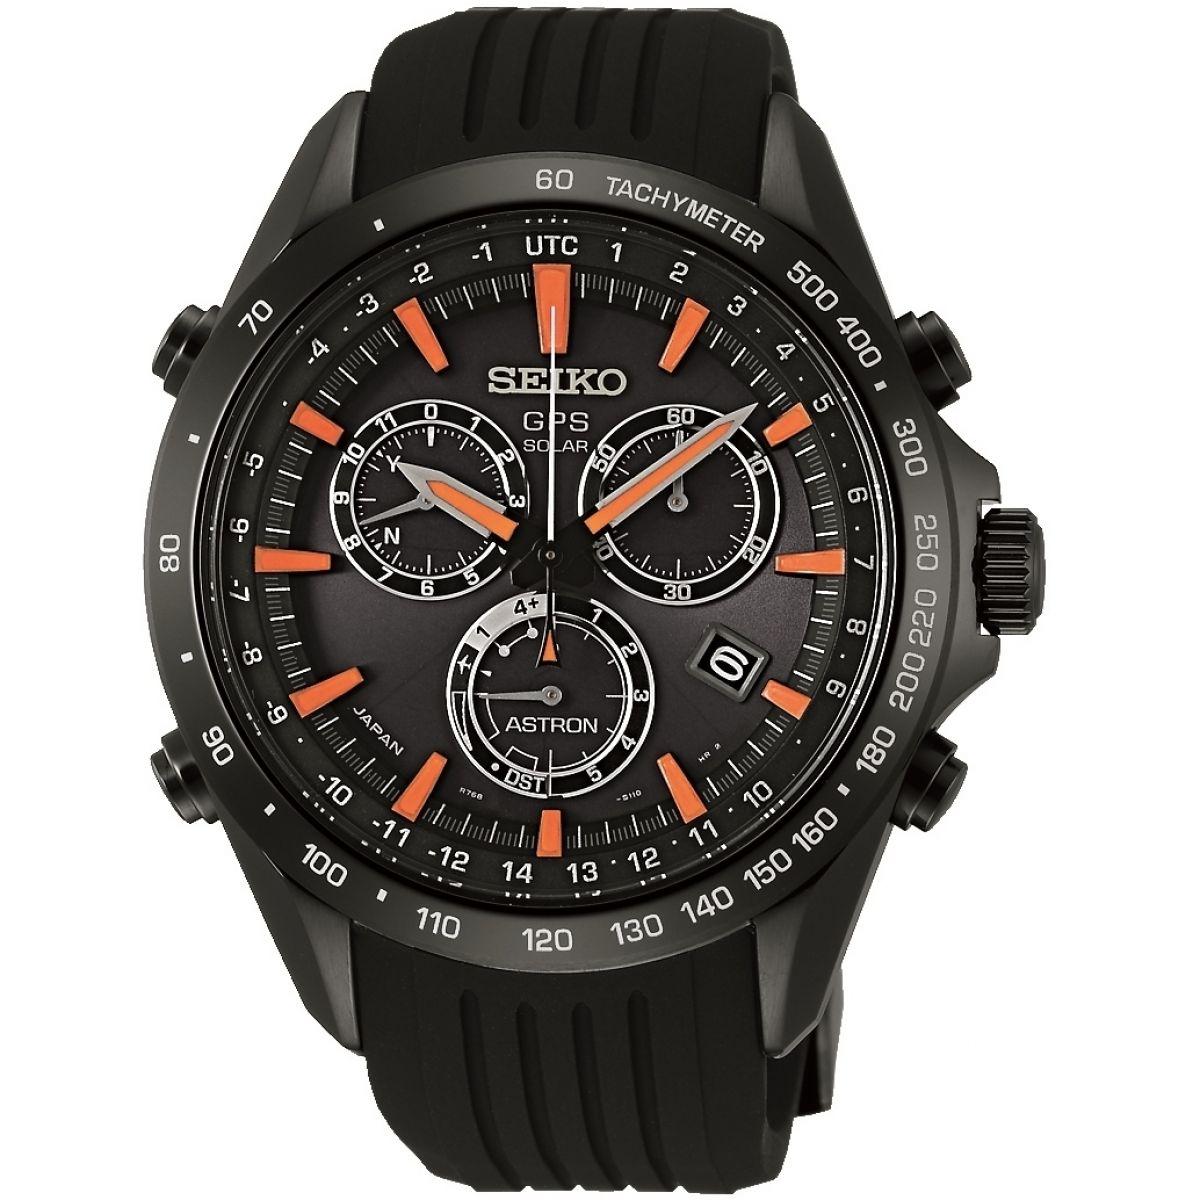 gents seiko astron gps chronograph watch sse017j1 watchshop com rh watchshop com seiko astron 8x82 user manual seiko astron gps solar user manual